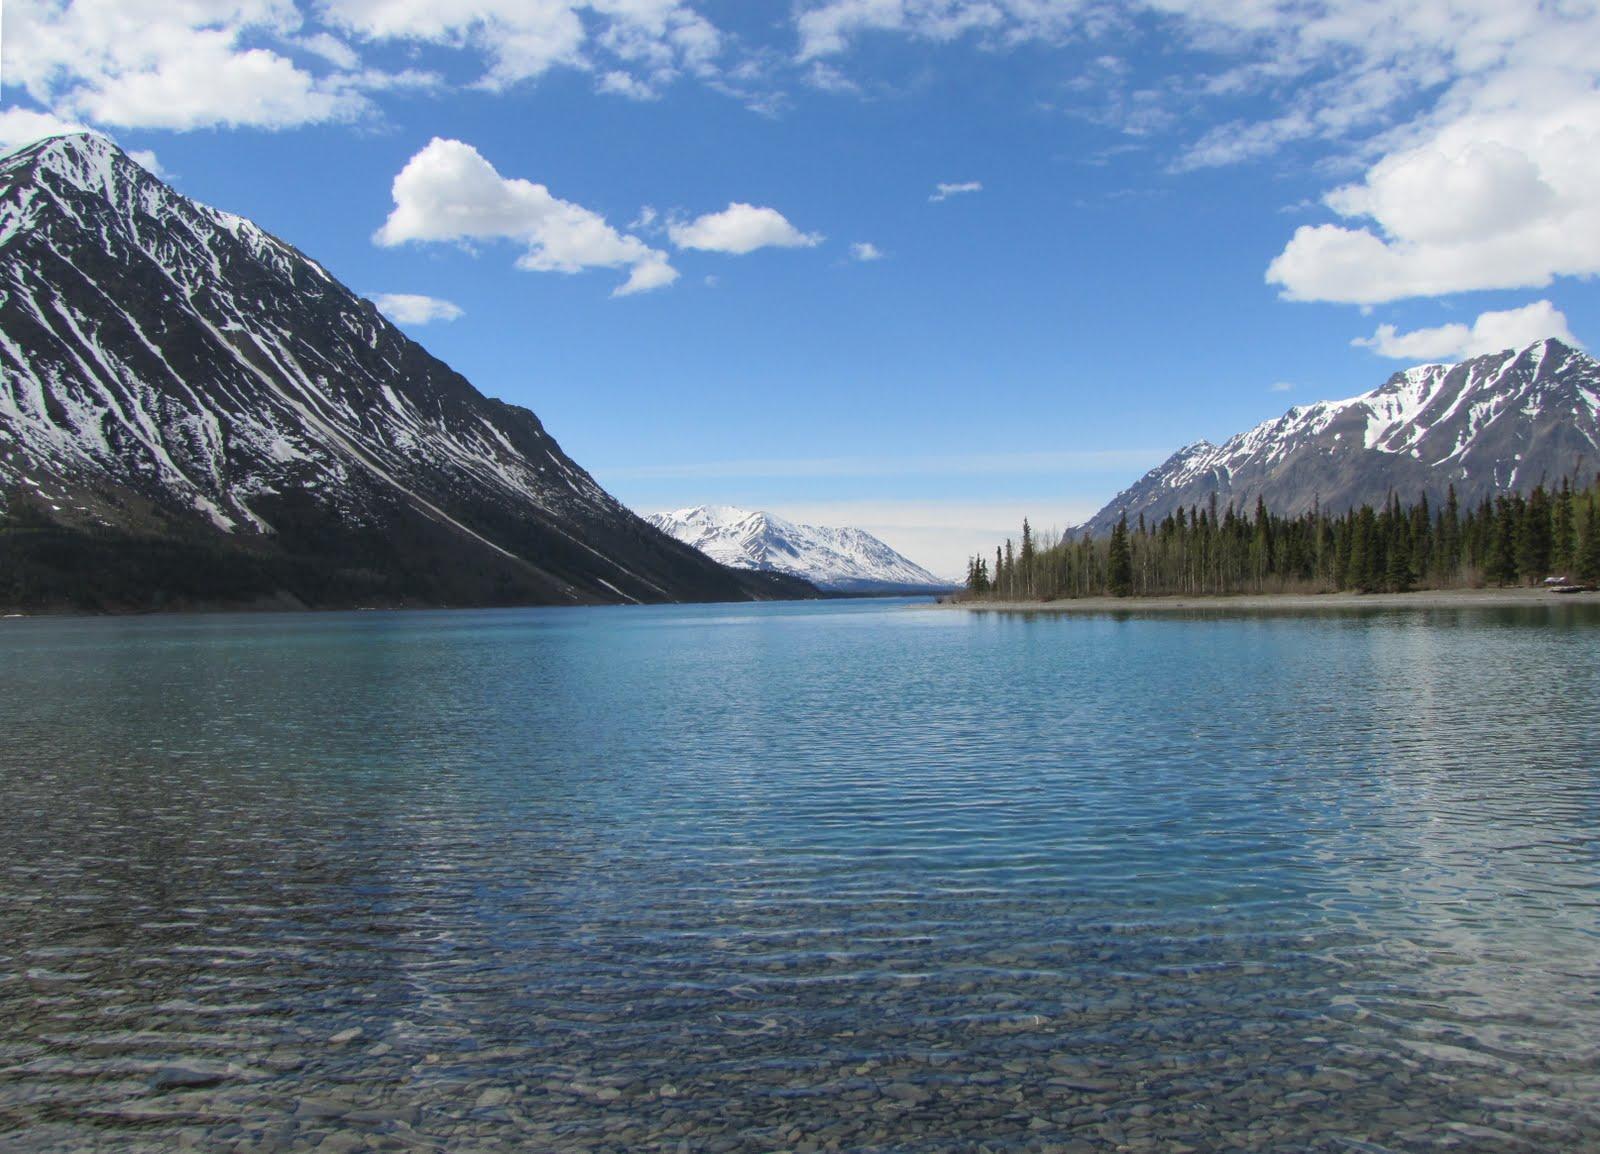 Summer Camp Haines Alaska 2010 Kathleen Lake Yukon Territory